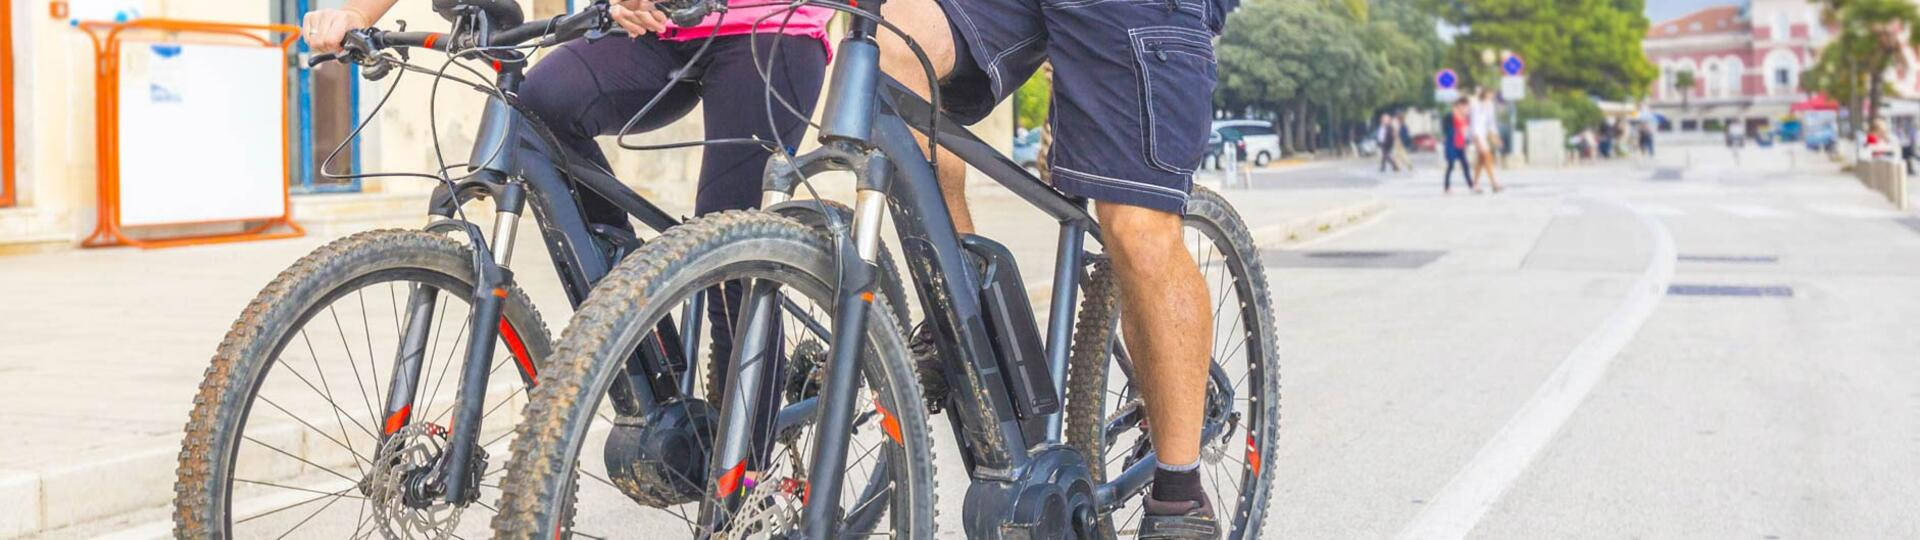 cycling.oxygenhotel de e-bike-rimini 014